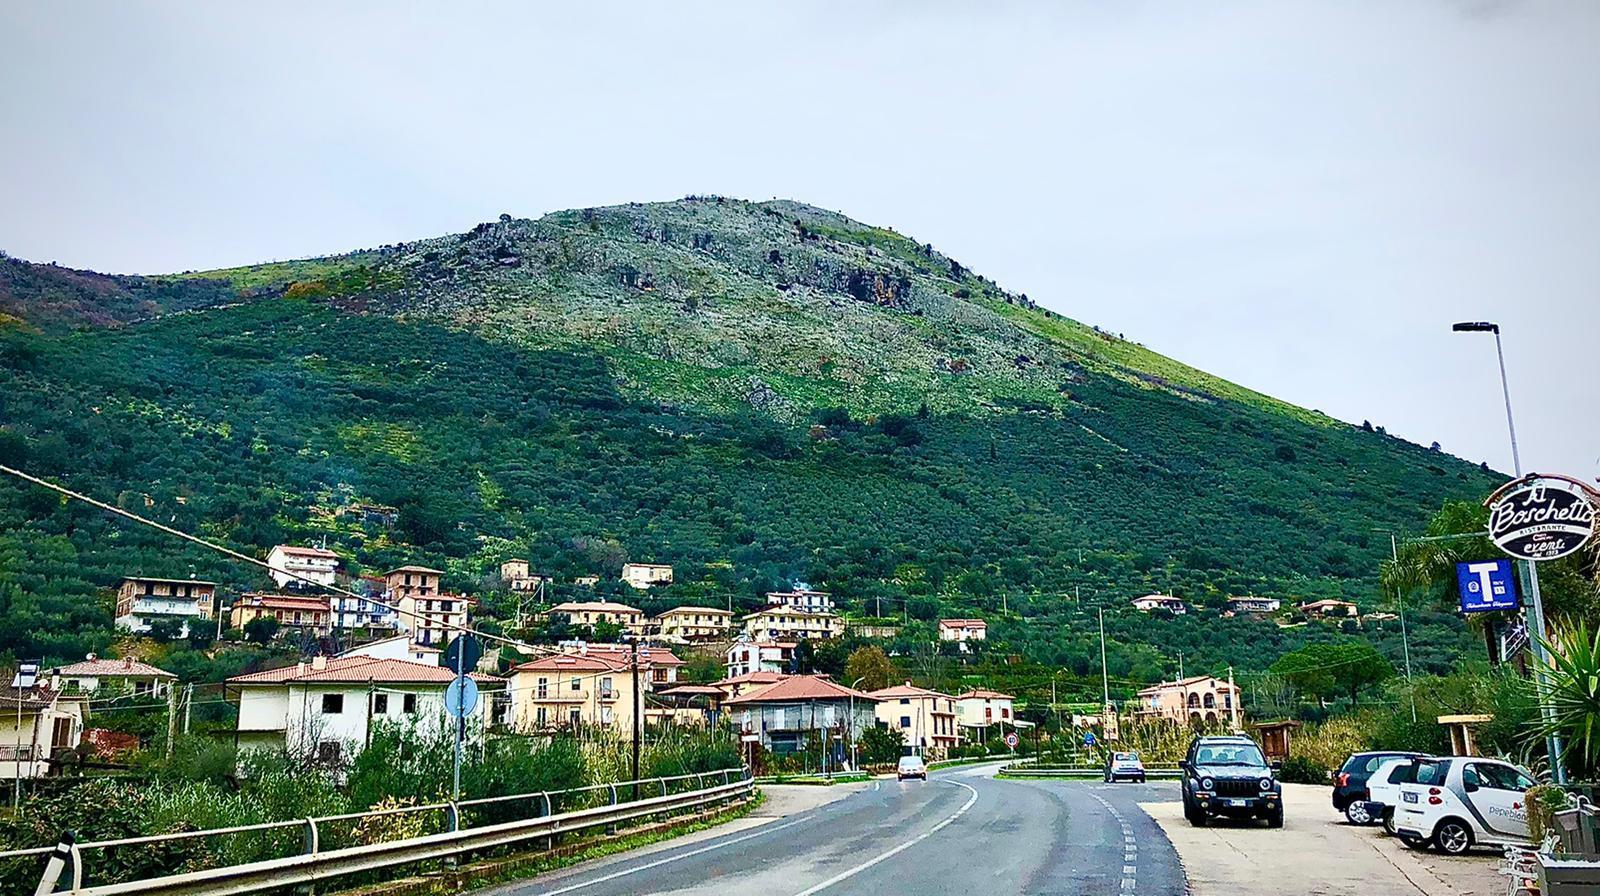 Curtignano